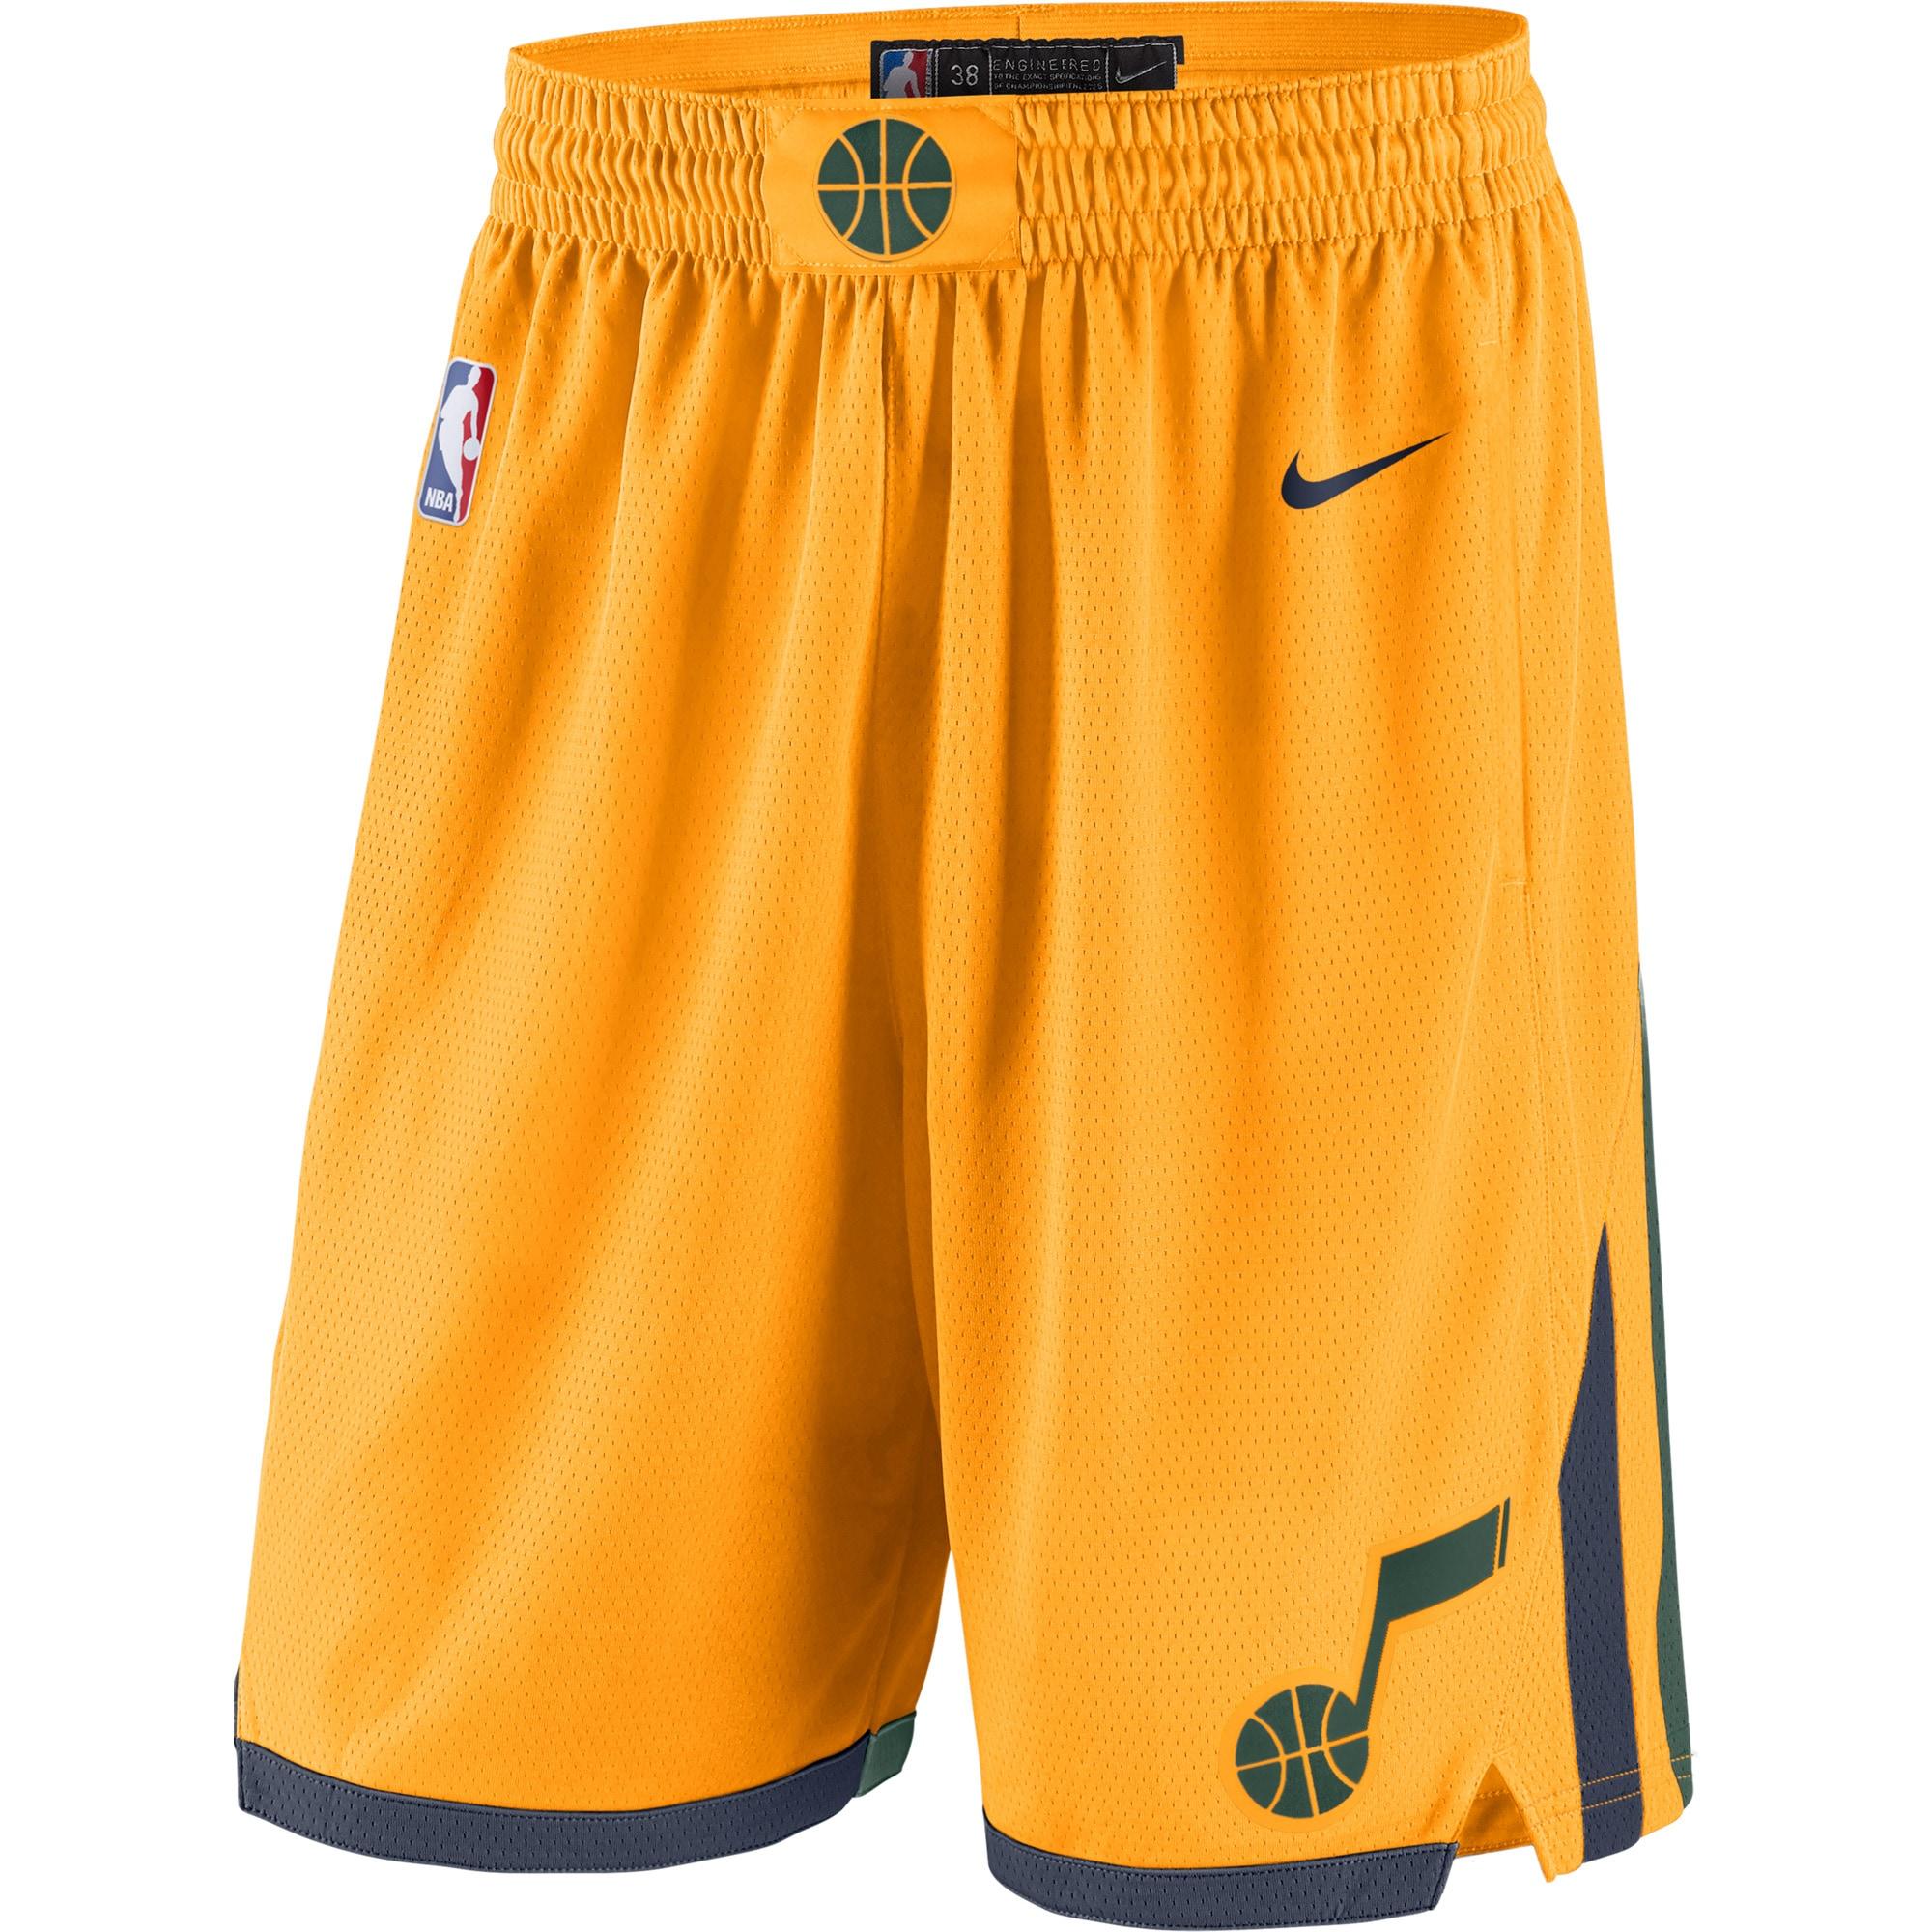 Utah Jazz Nike 2019/20 Statement Edition Swingman Shorts - Gold